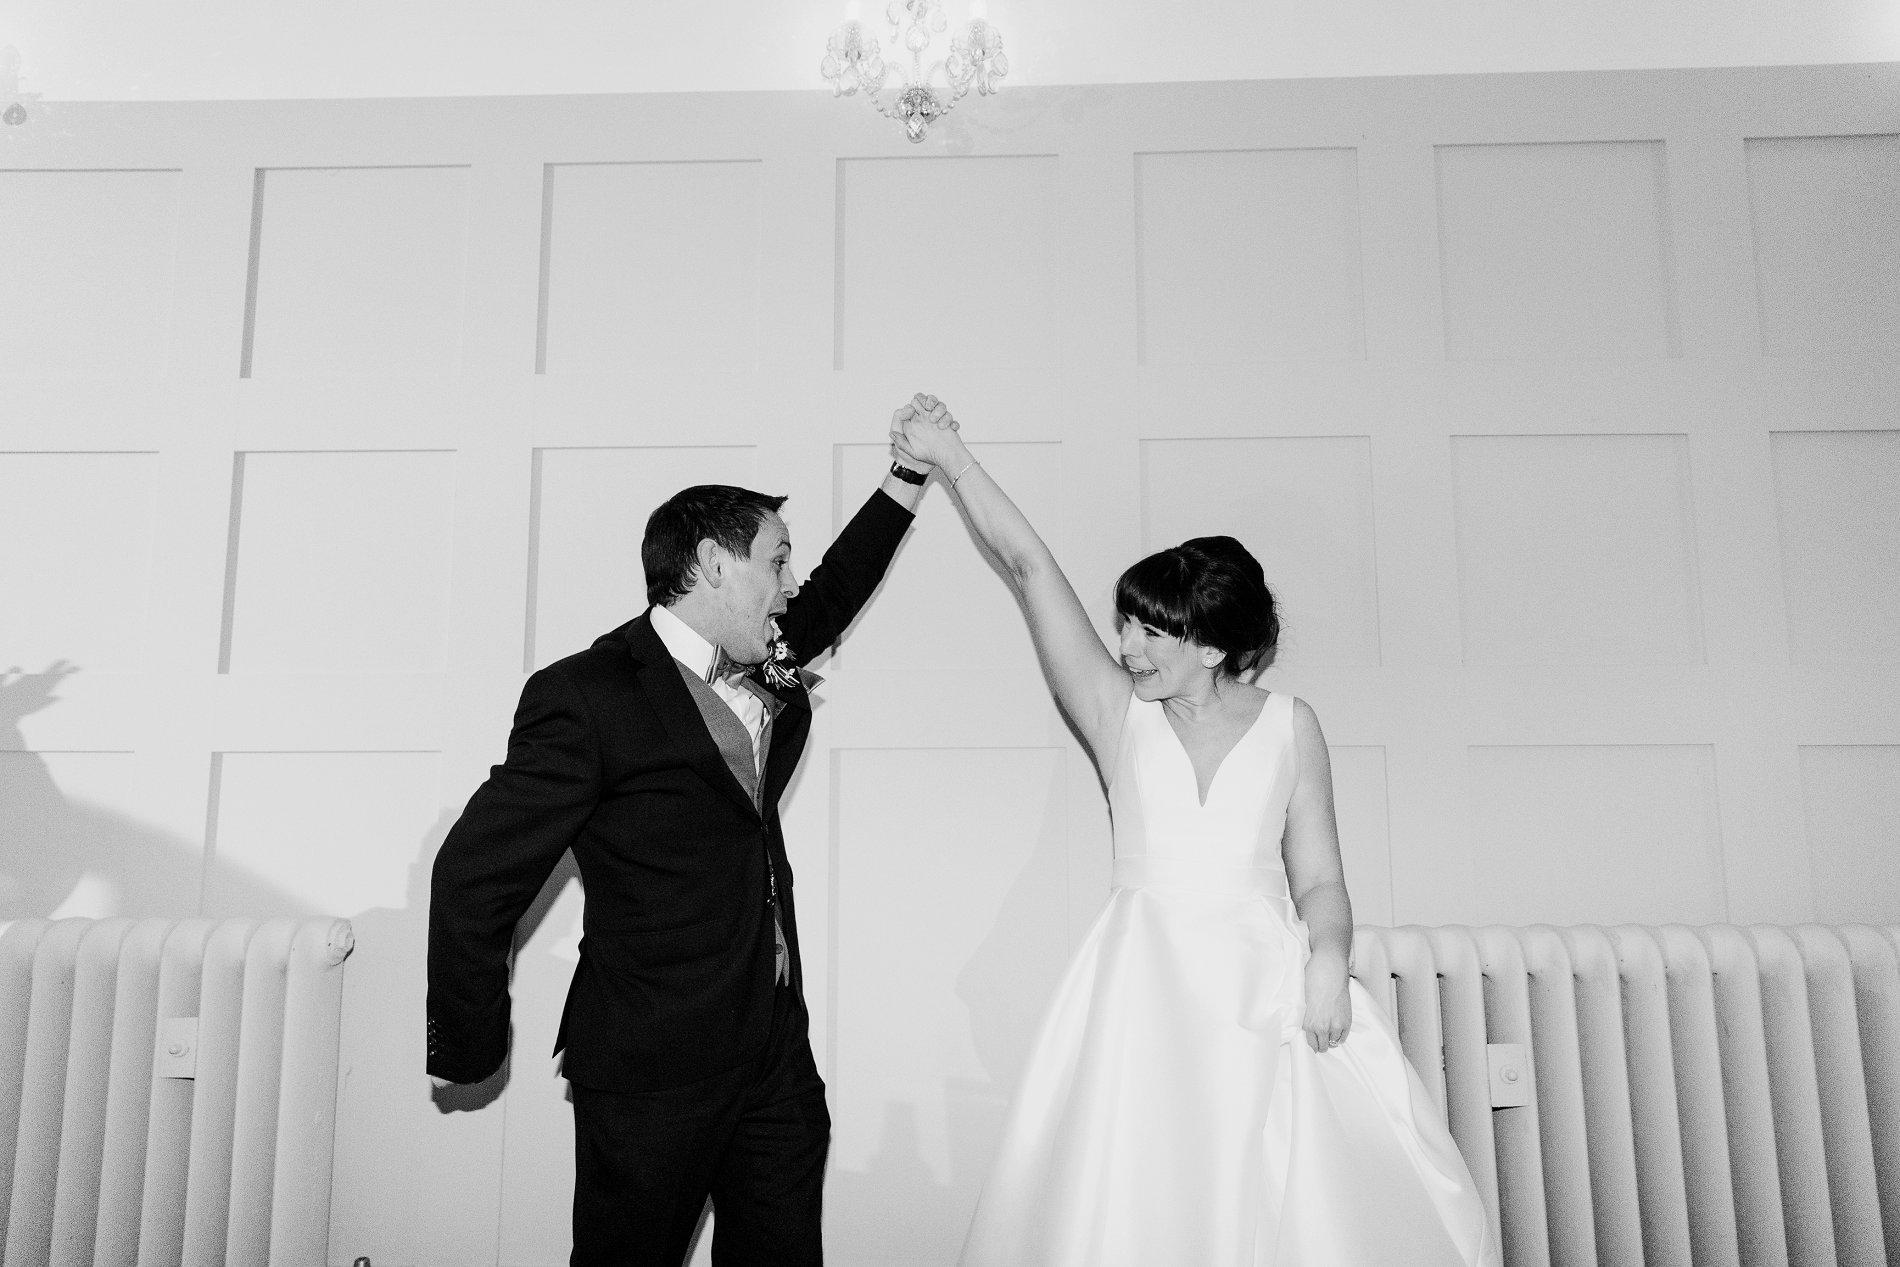 An Elegant White Wedding at Thicket Priory (c) Carla Whittingham Photography (97)